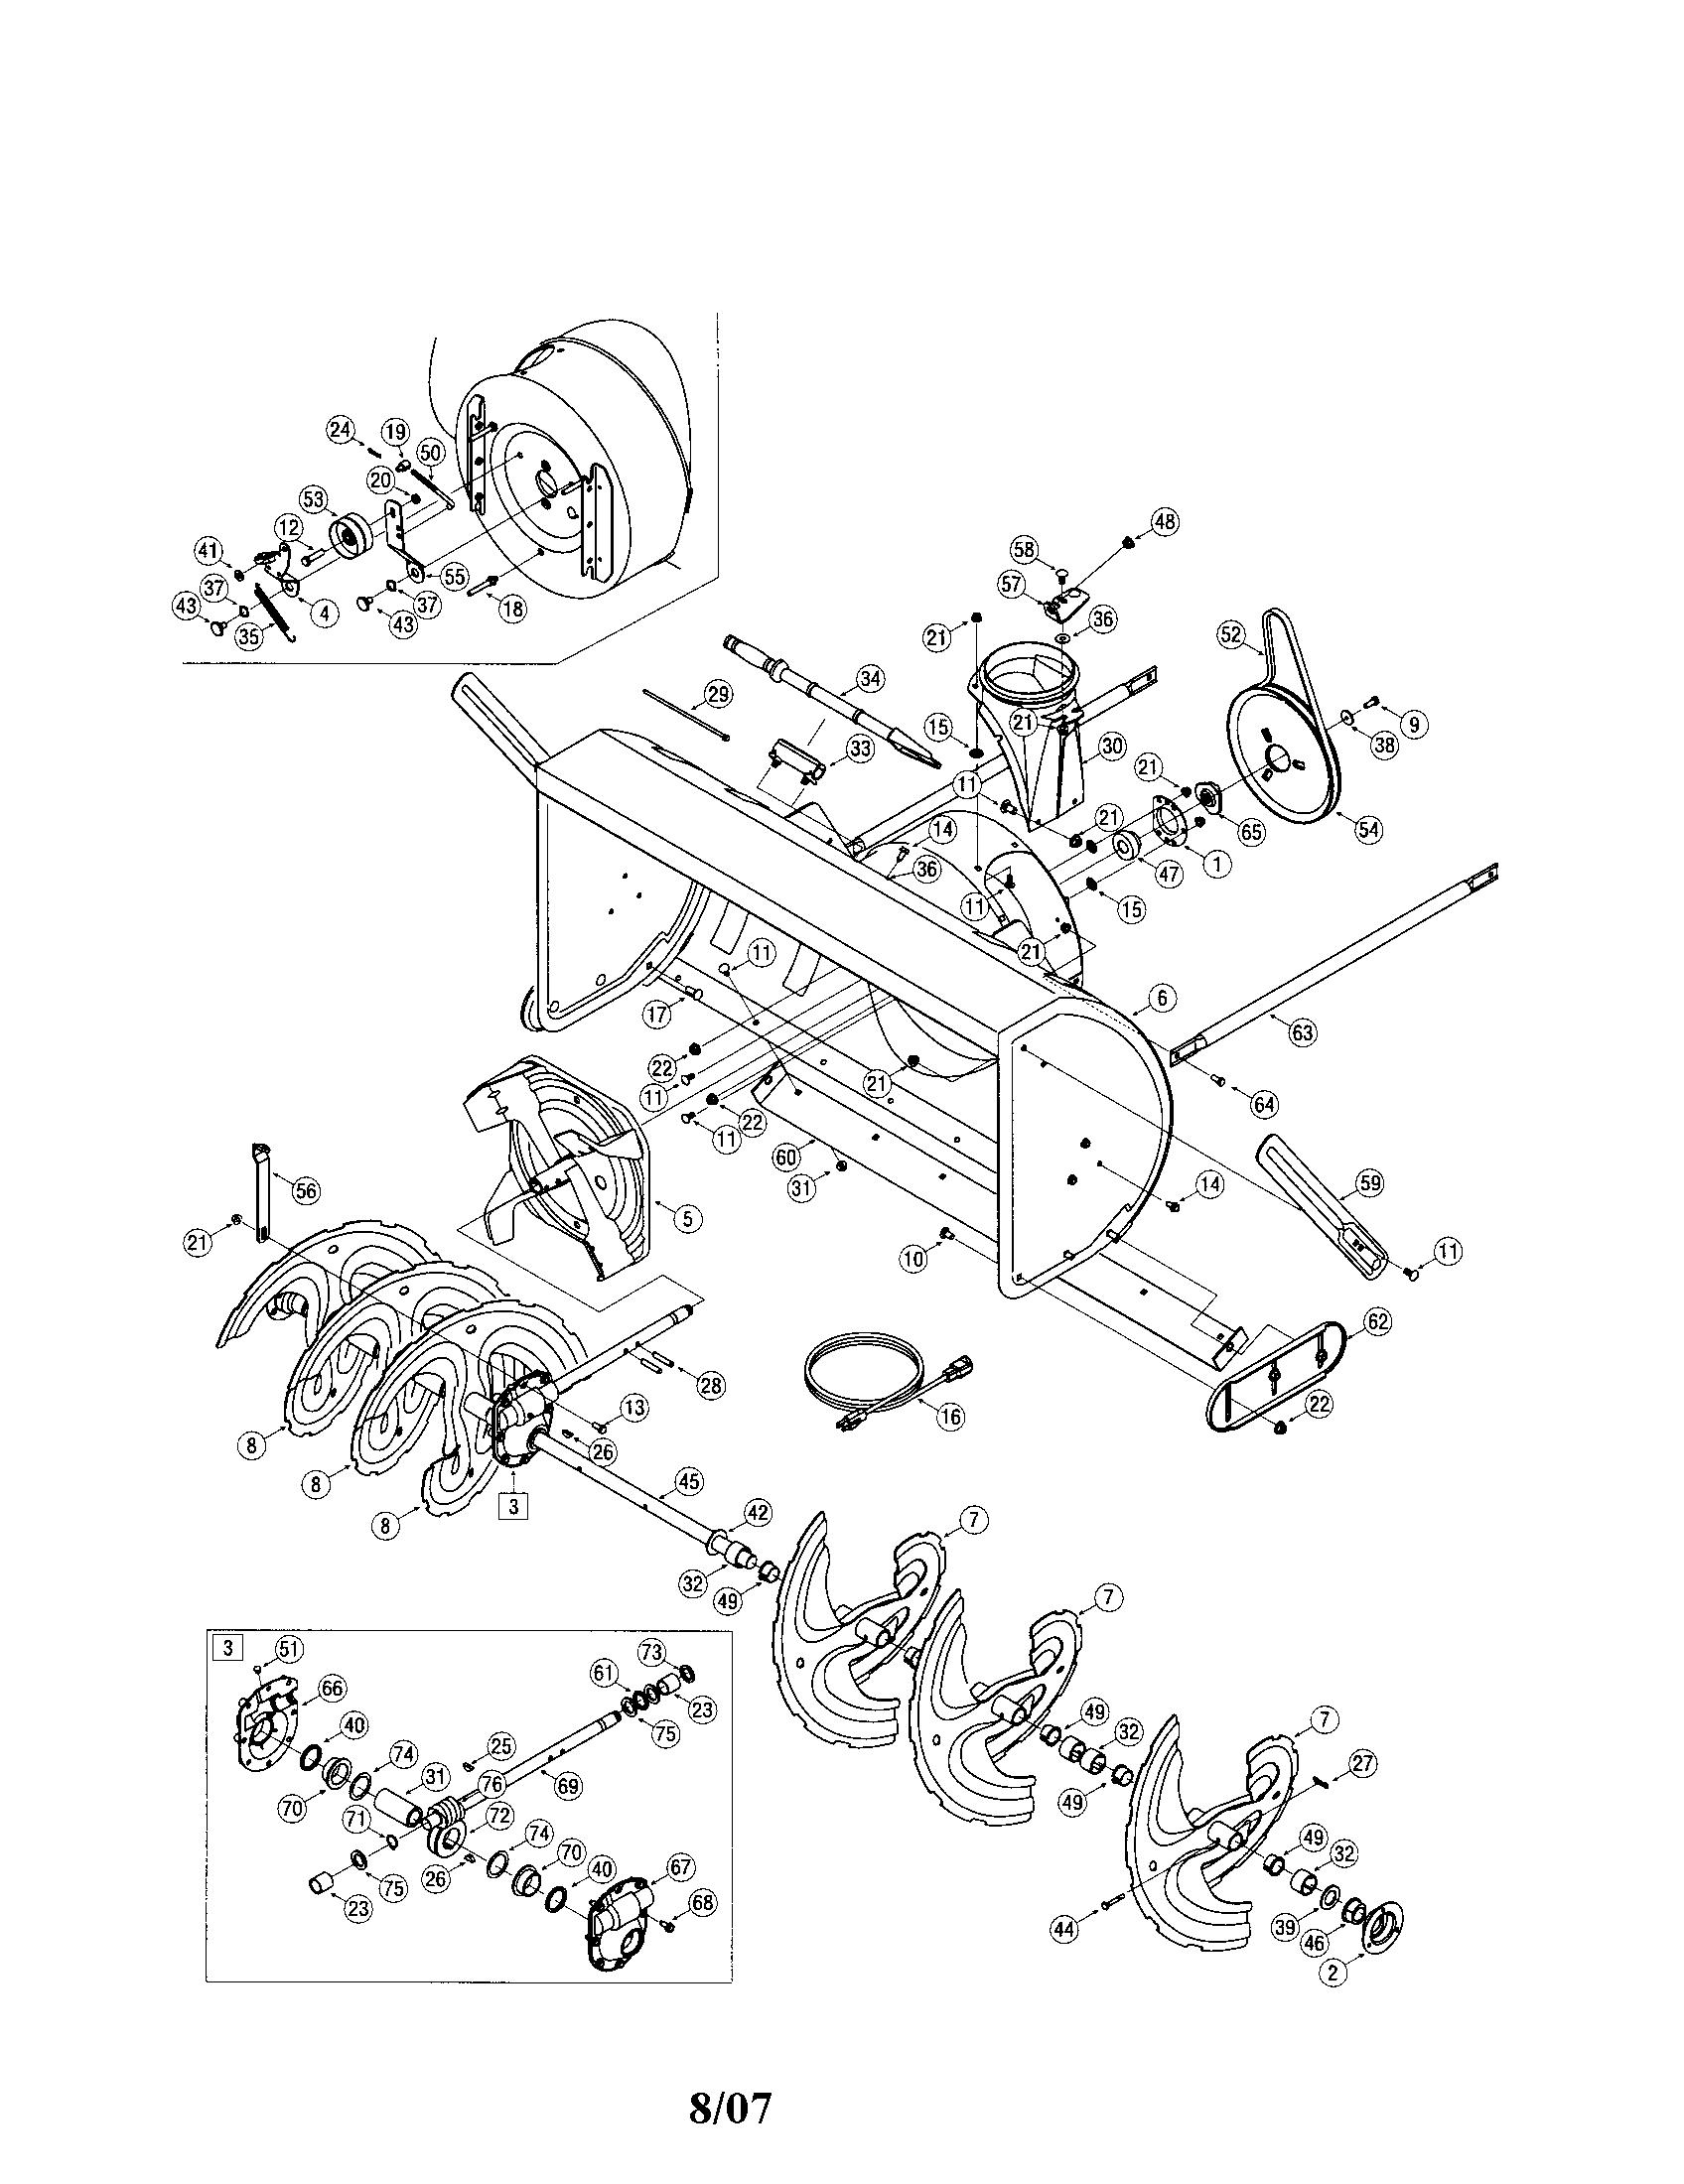 Sears craftsman snowblower parts manual